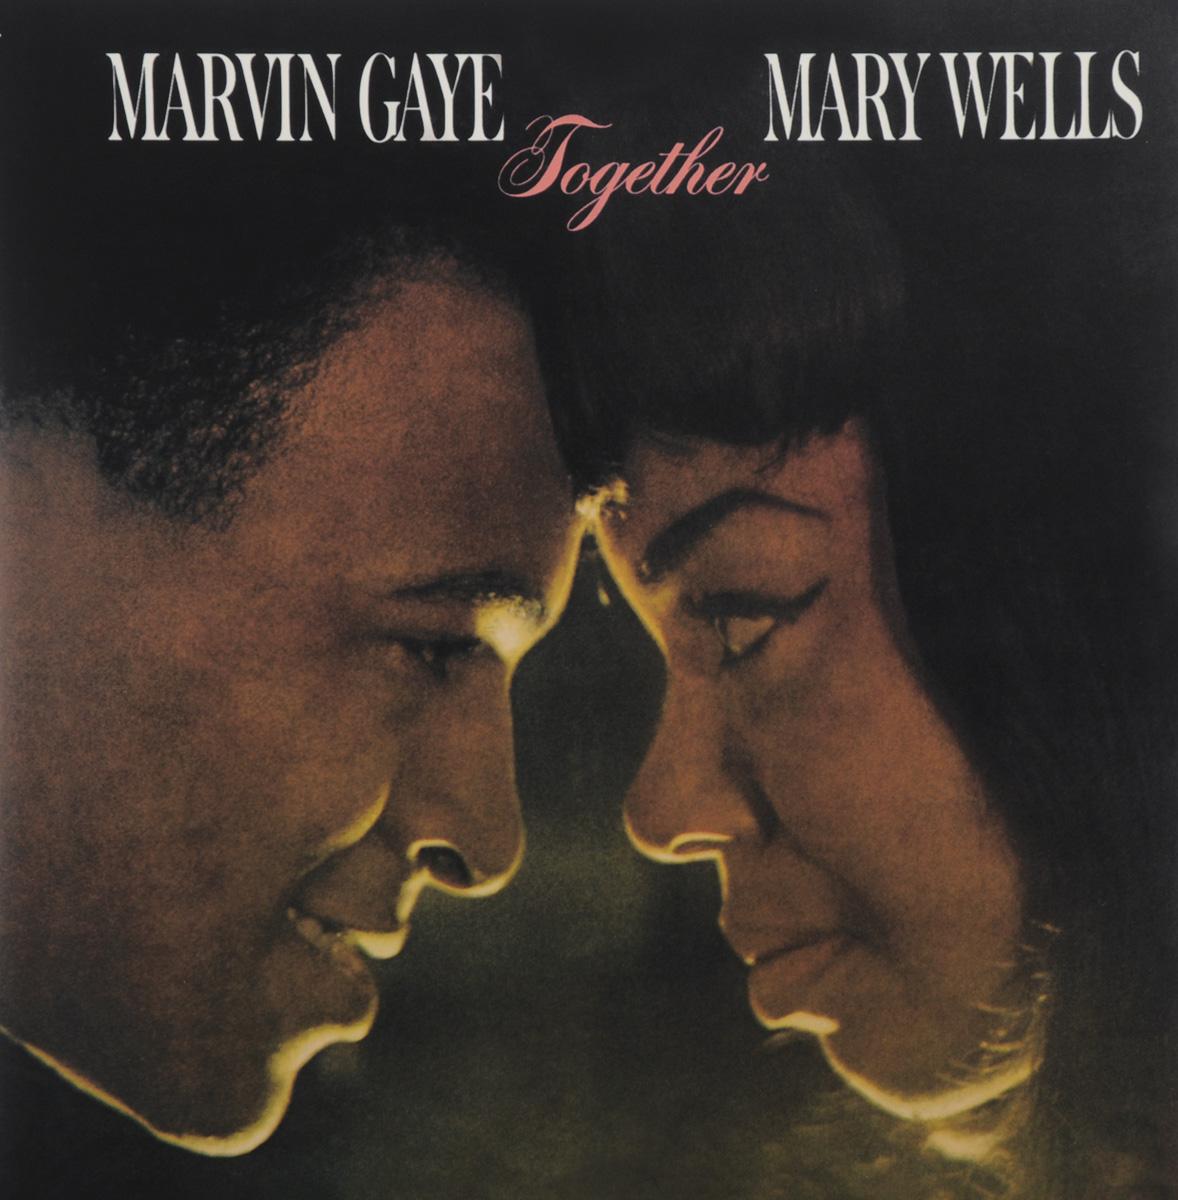 Марвин Гэй,Мэри Уэллс Marvin Gaye And Mary Wells. Together (LP) марвин гэй marvin gaye a tribute to the great nat king cole lp